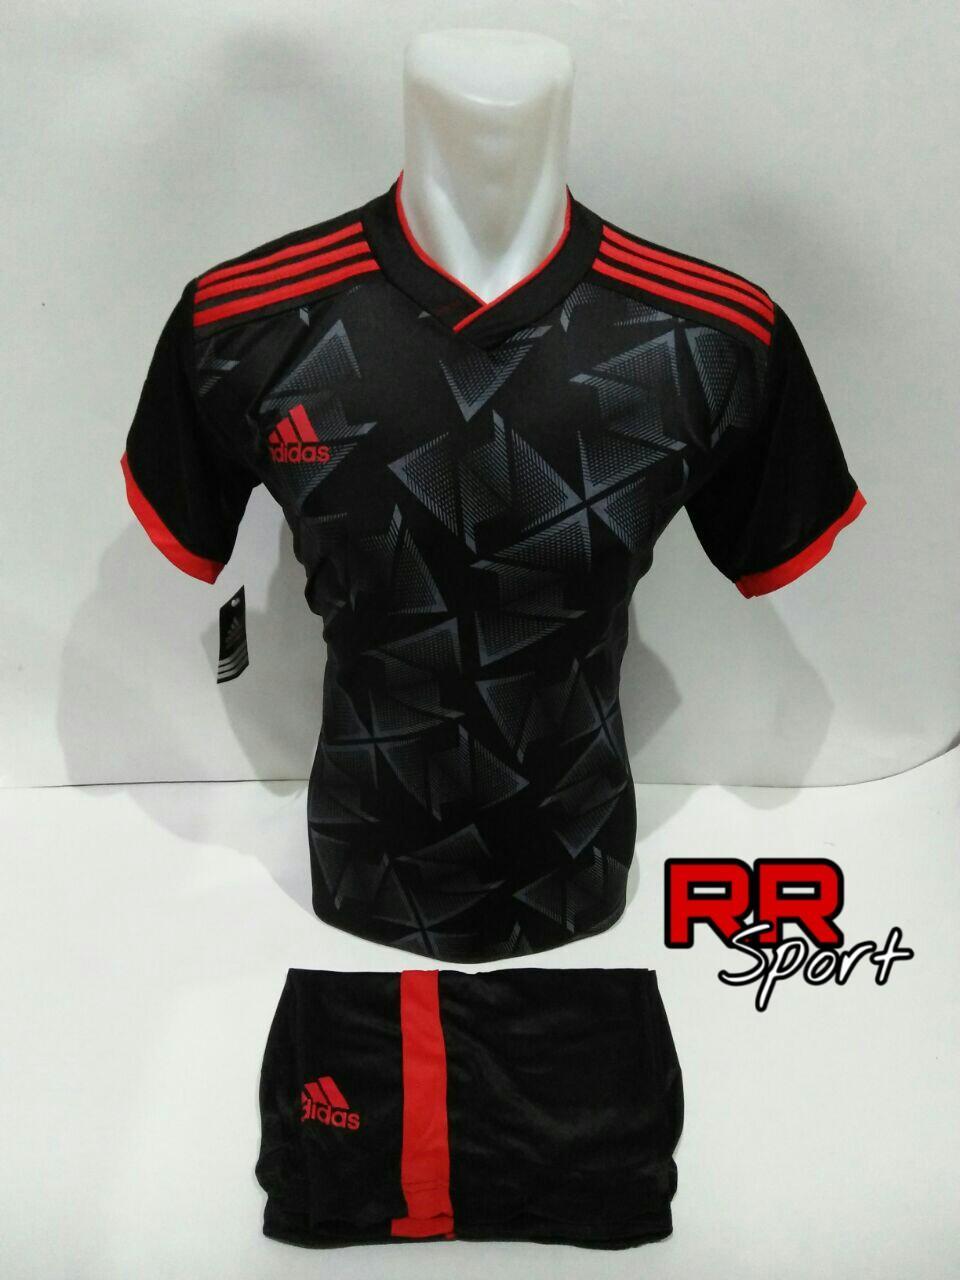 Jual Jersey Olahraga Pria Jeep Jpw61802 Jam Tangan Hitam Merah Baju Kaos Bola Setelan Futsal Volley Ad 08